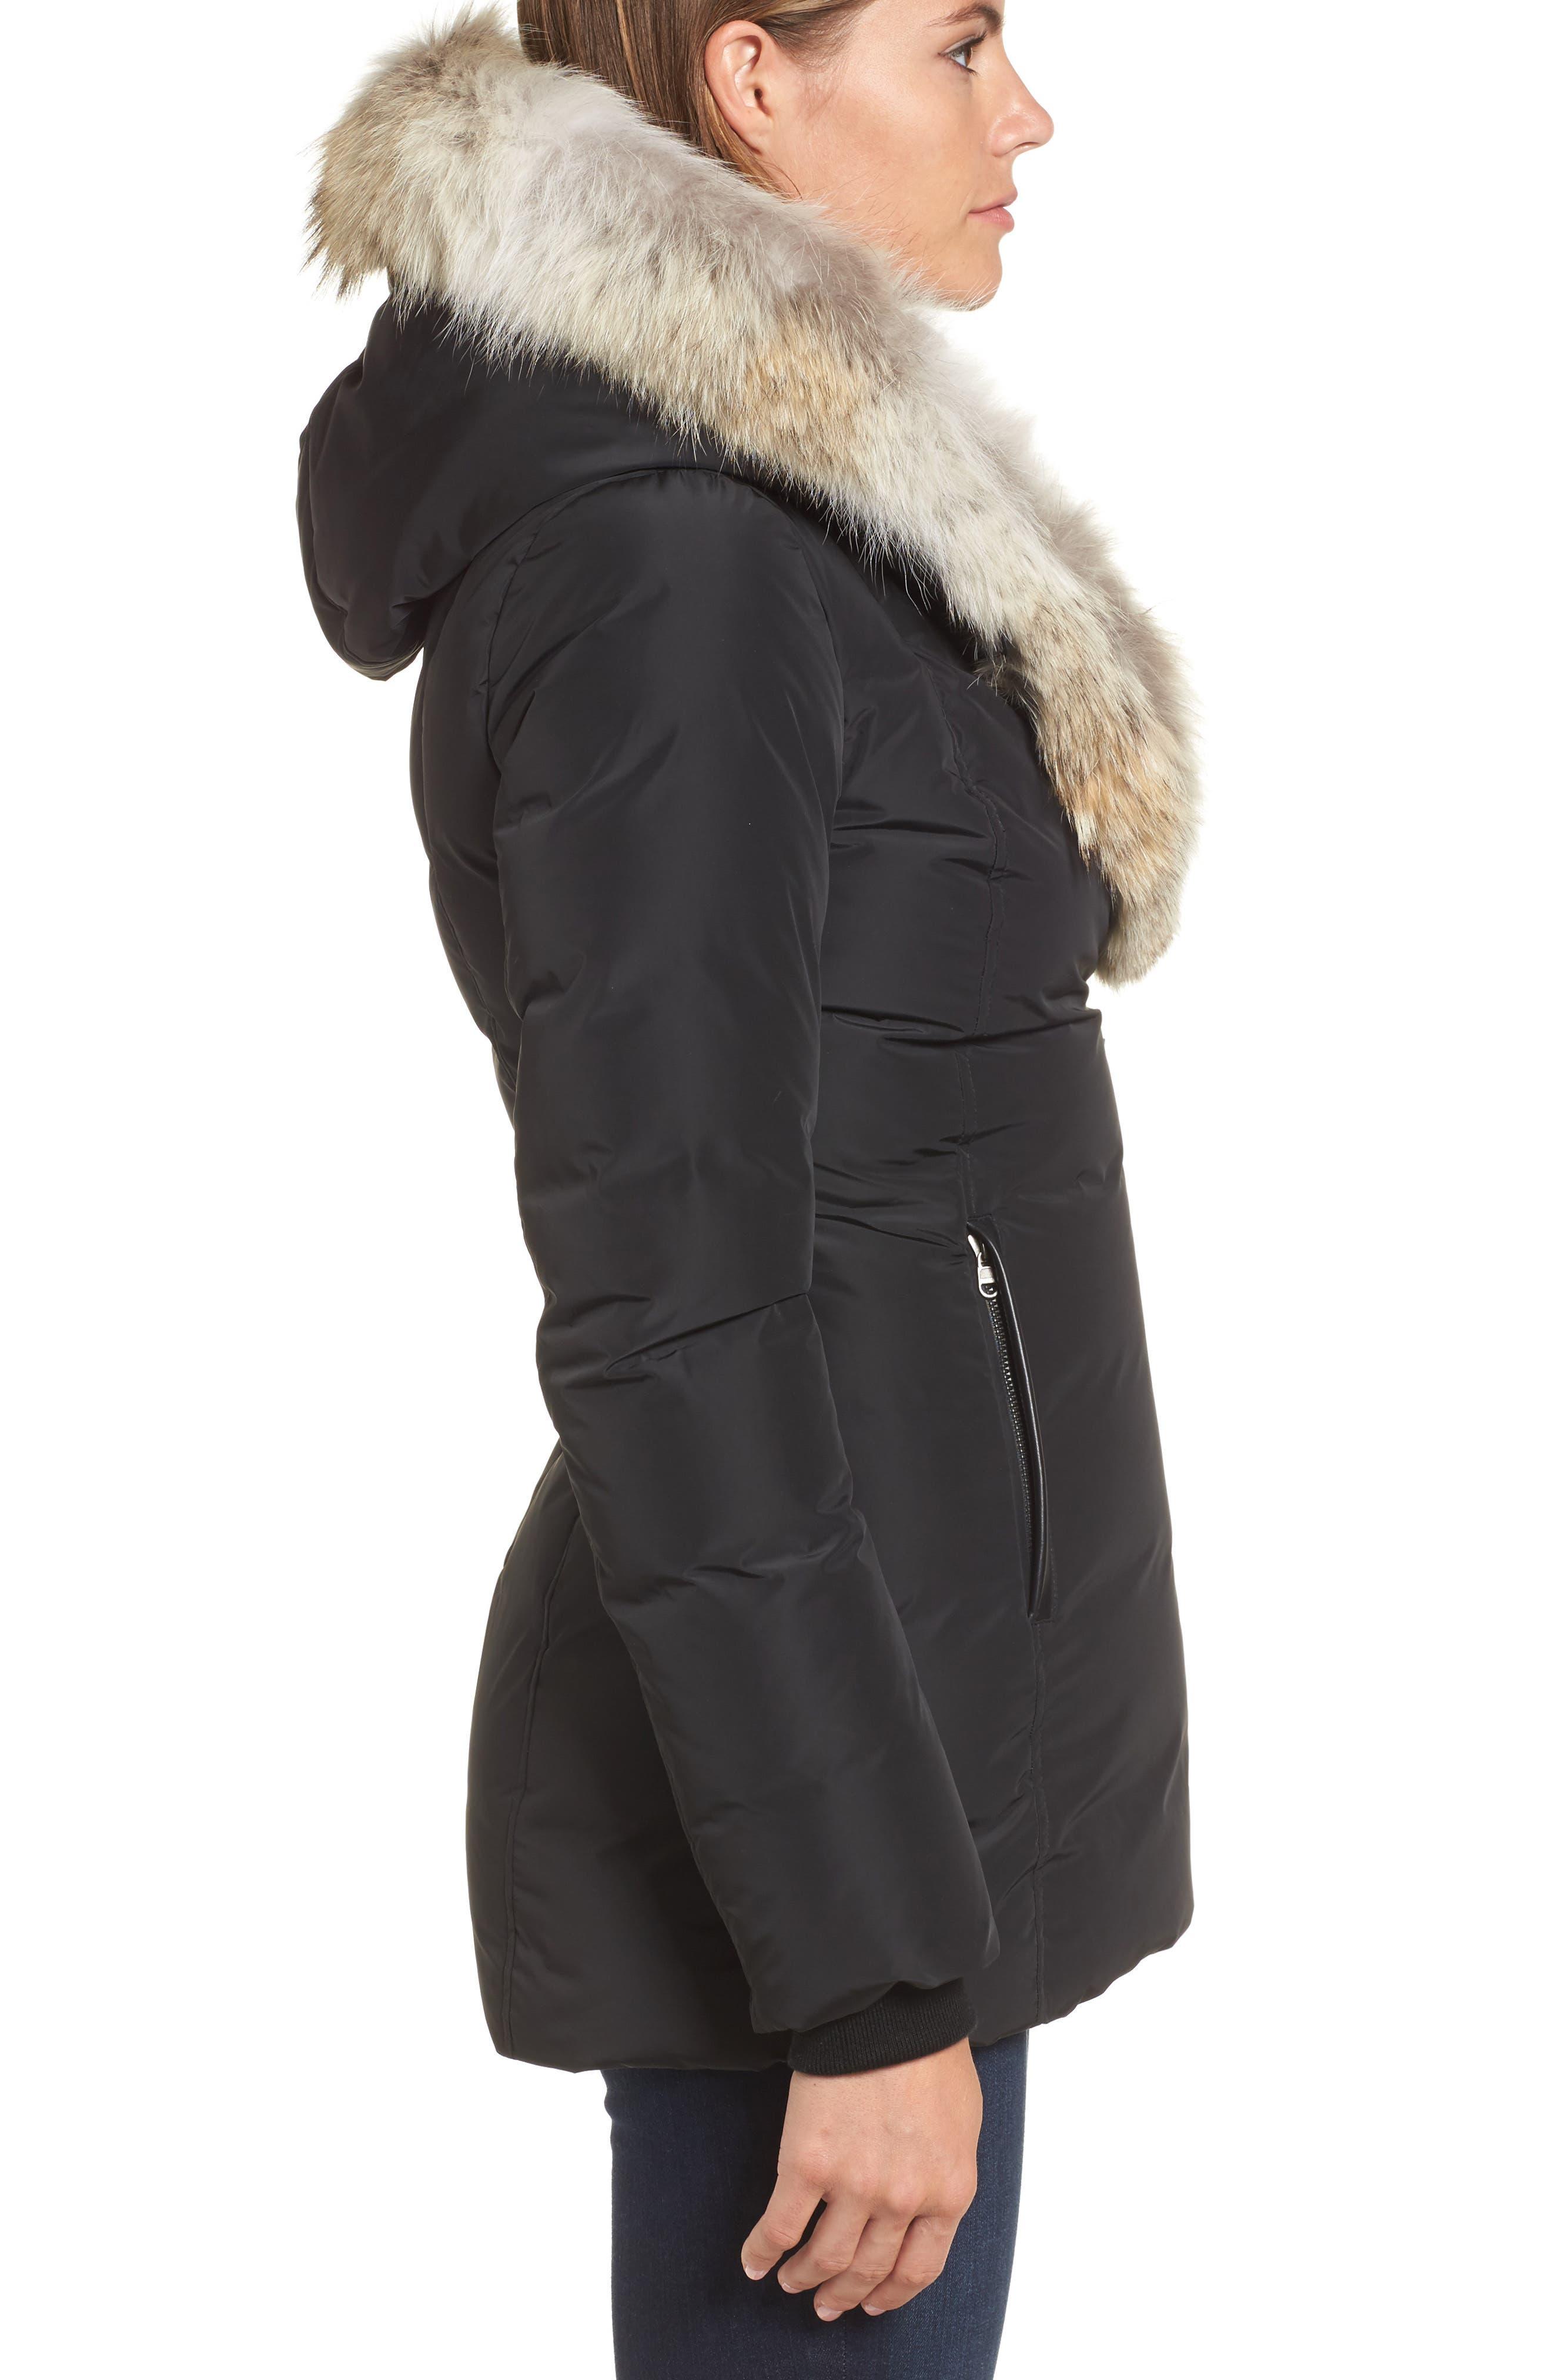 MACKAGE, Hooded Down Parka with Inset Bib & Genuine Fox Fur Trim, Alternate thumbnail 4, color, 001